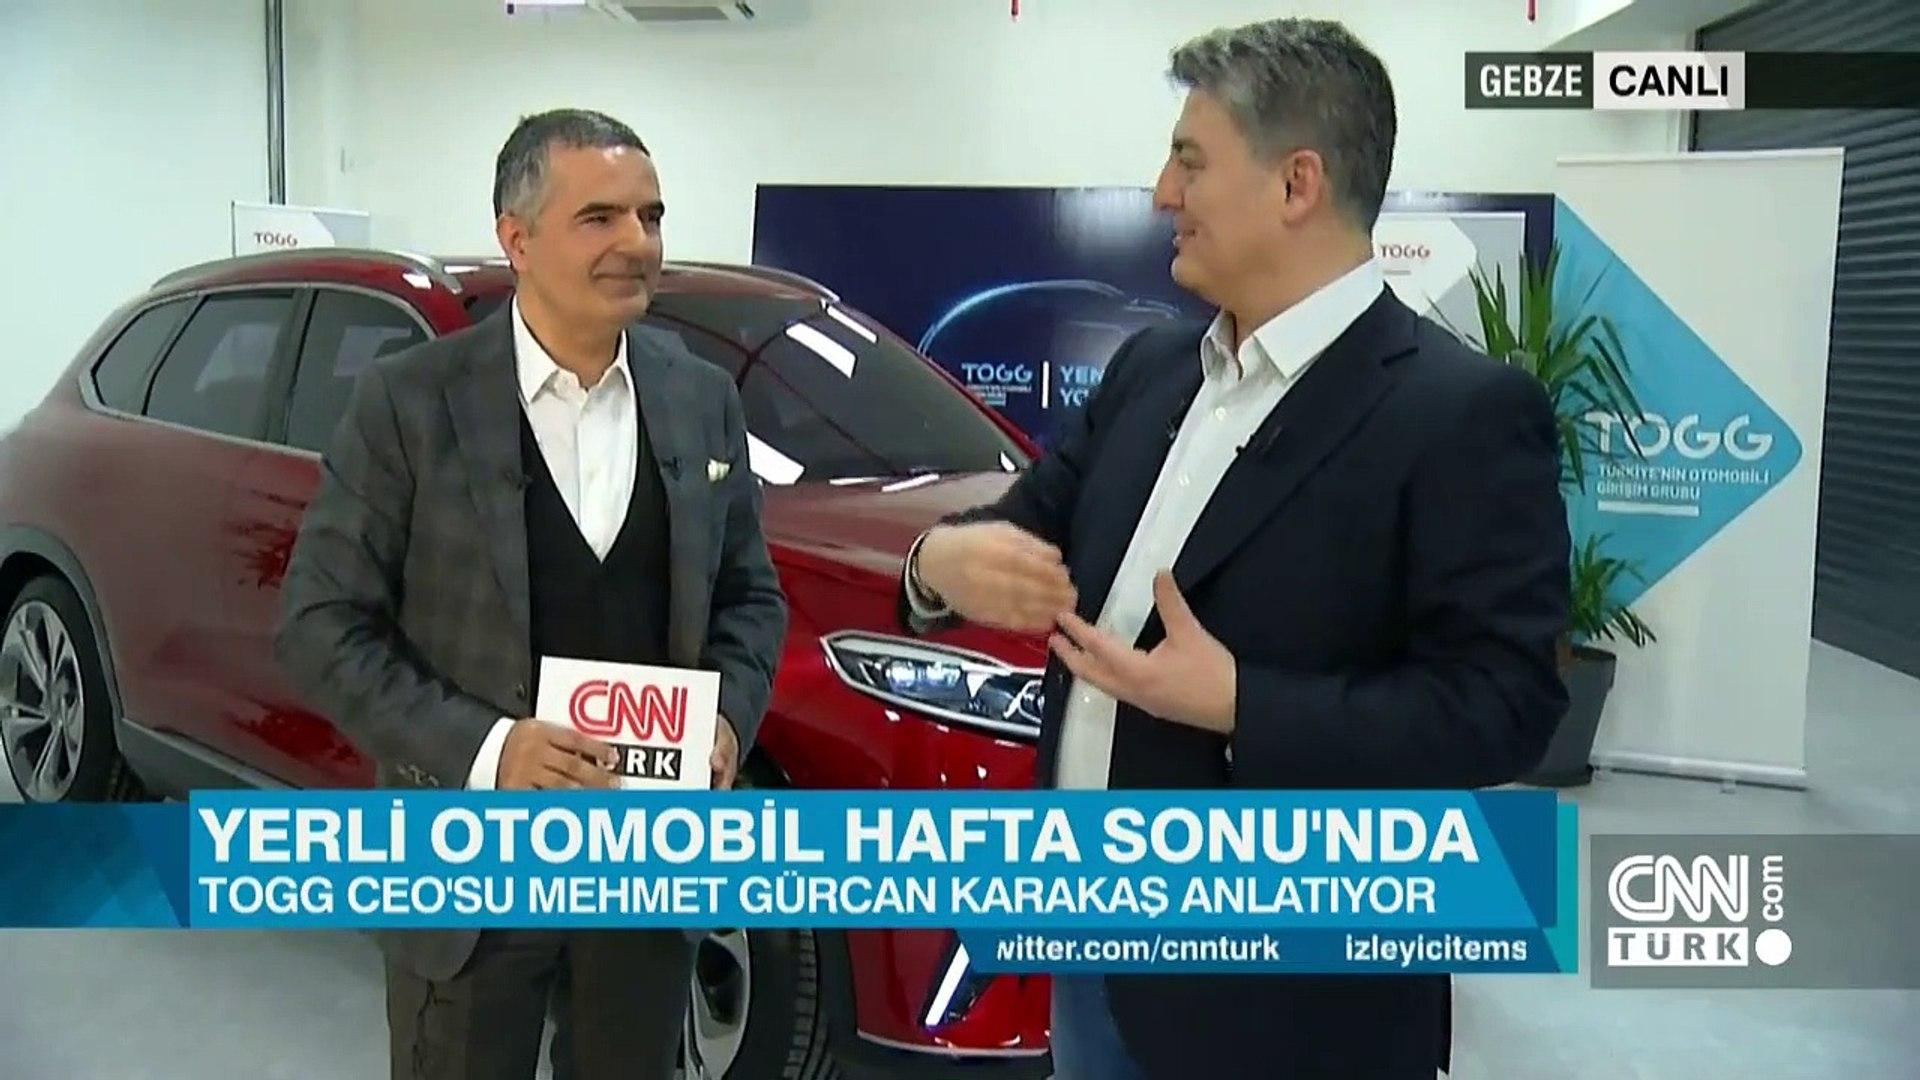 TOGG CEO'su Mehmet Gürcan Karakaş CNN TÜRK'te